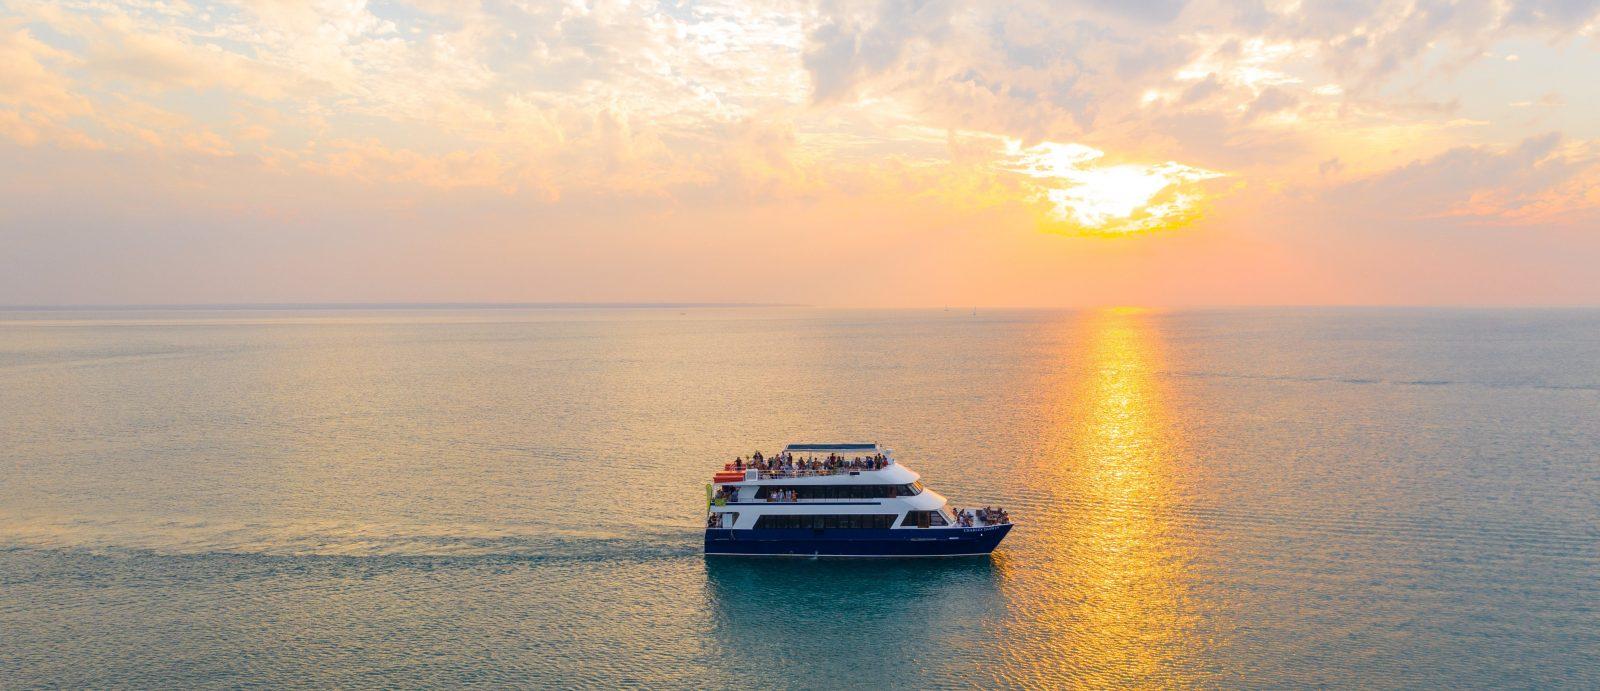 Experience a stunning Darwin sunset